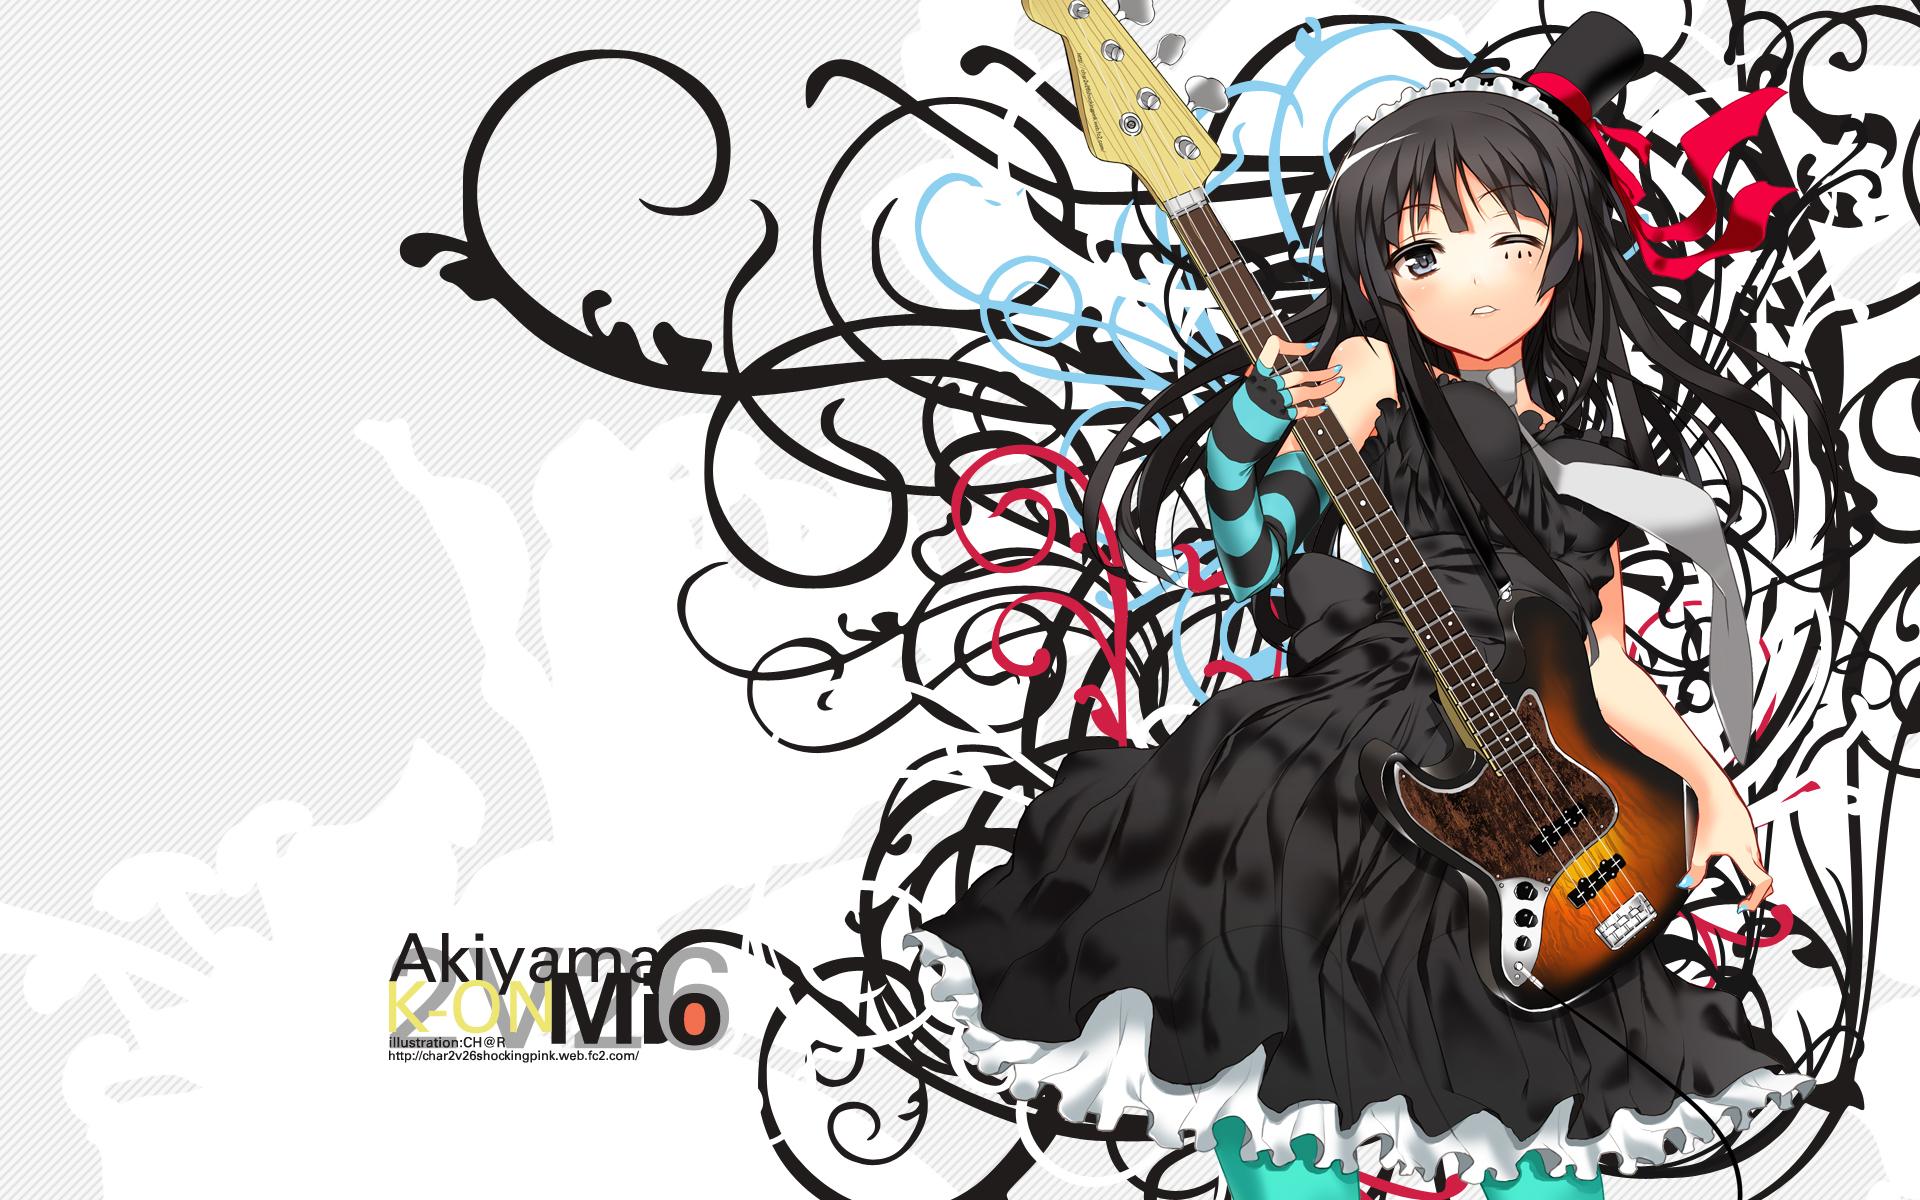 anime music images k - photo #13